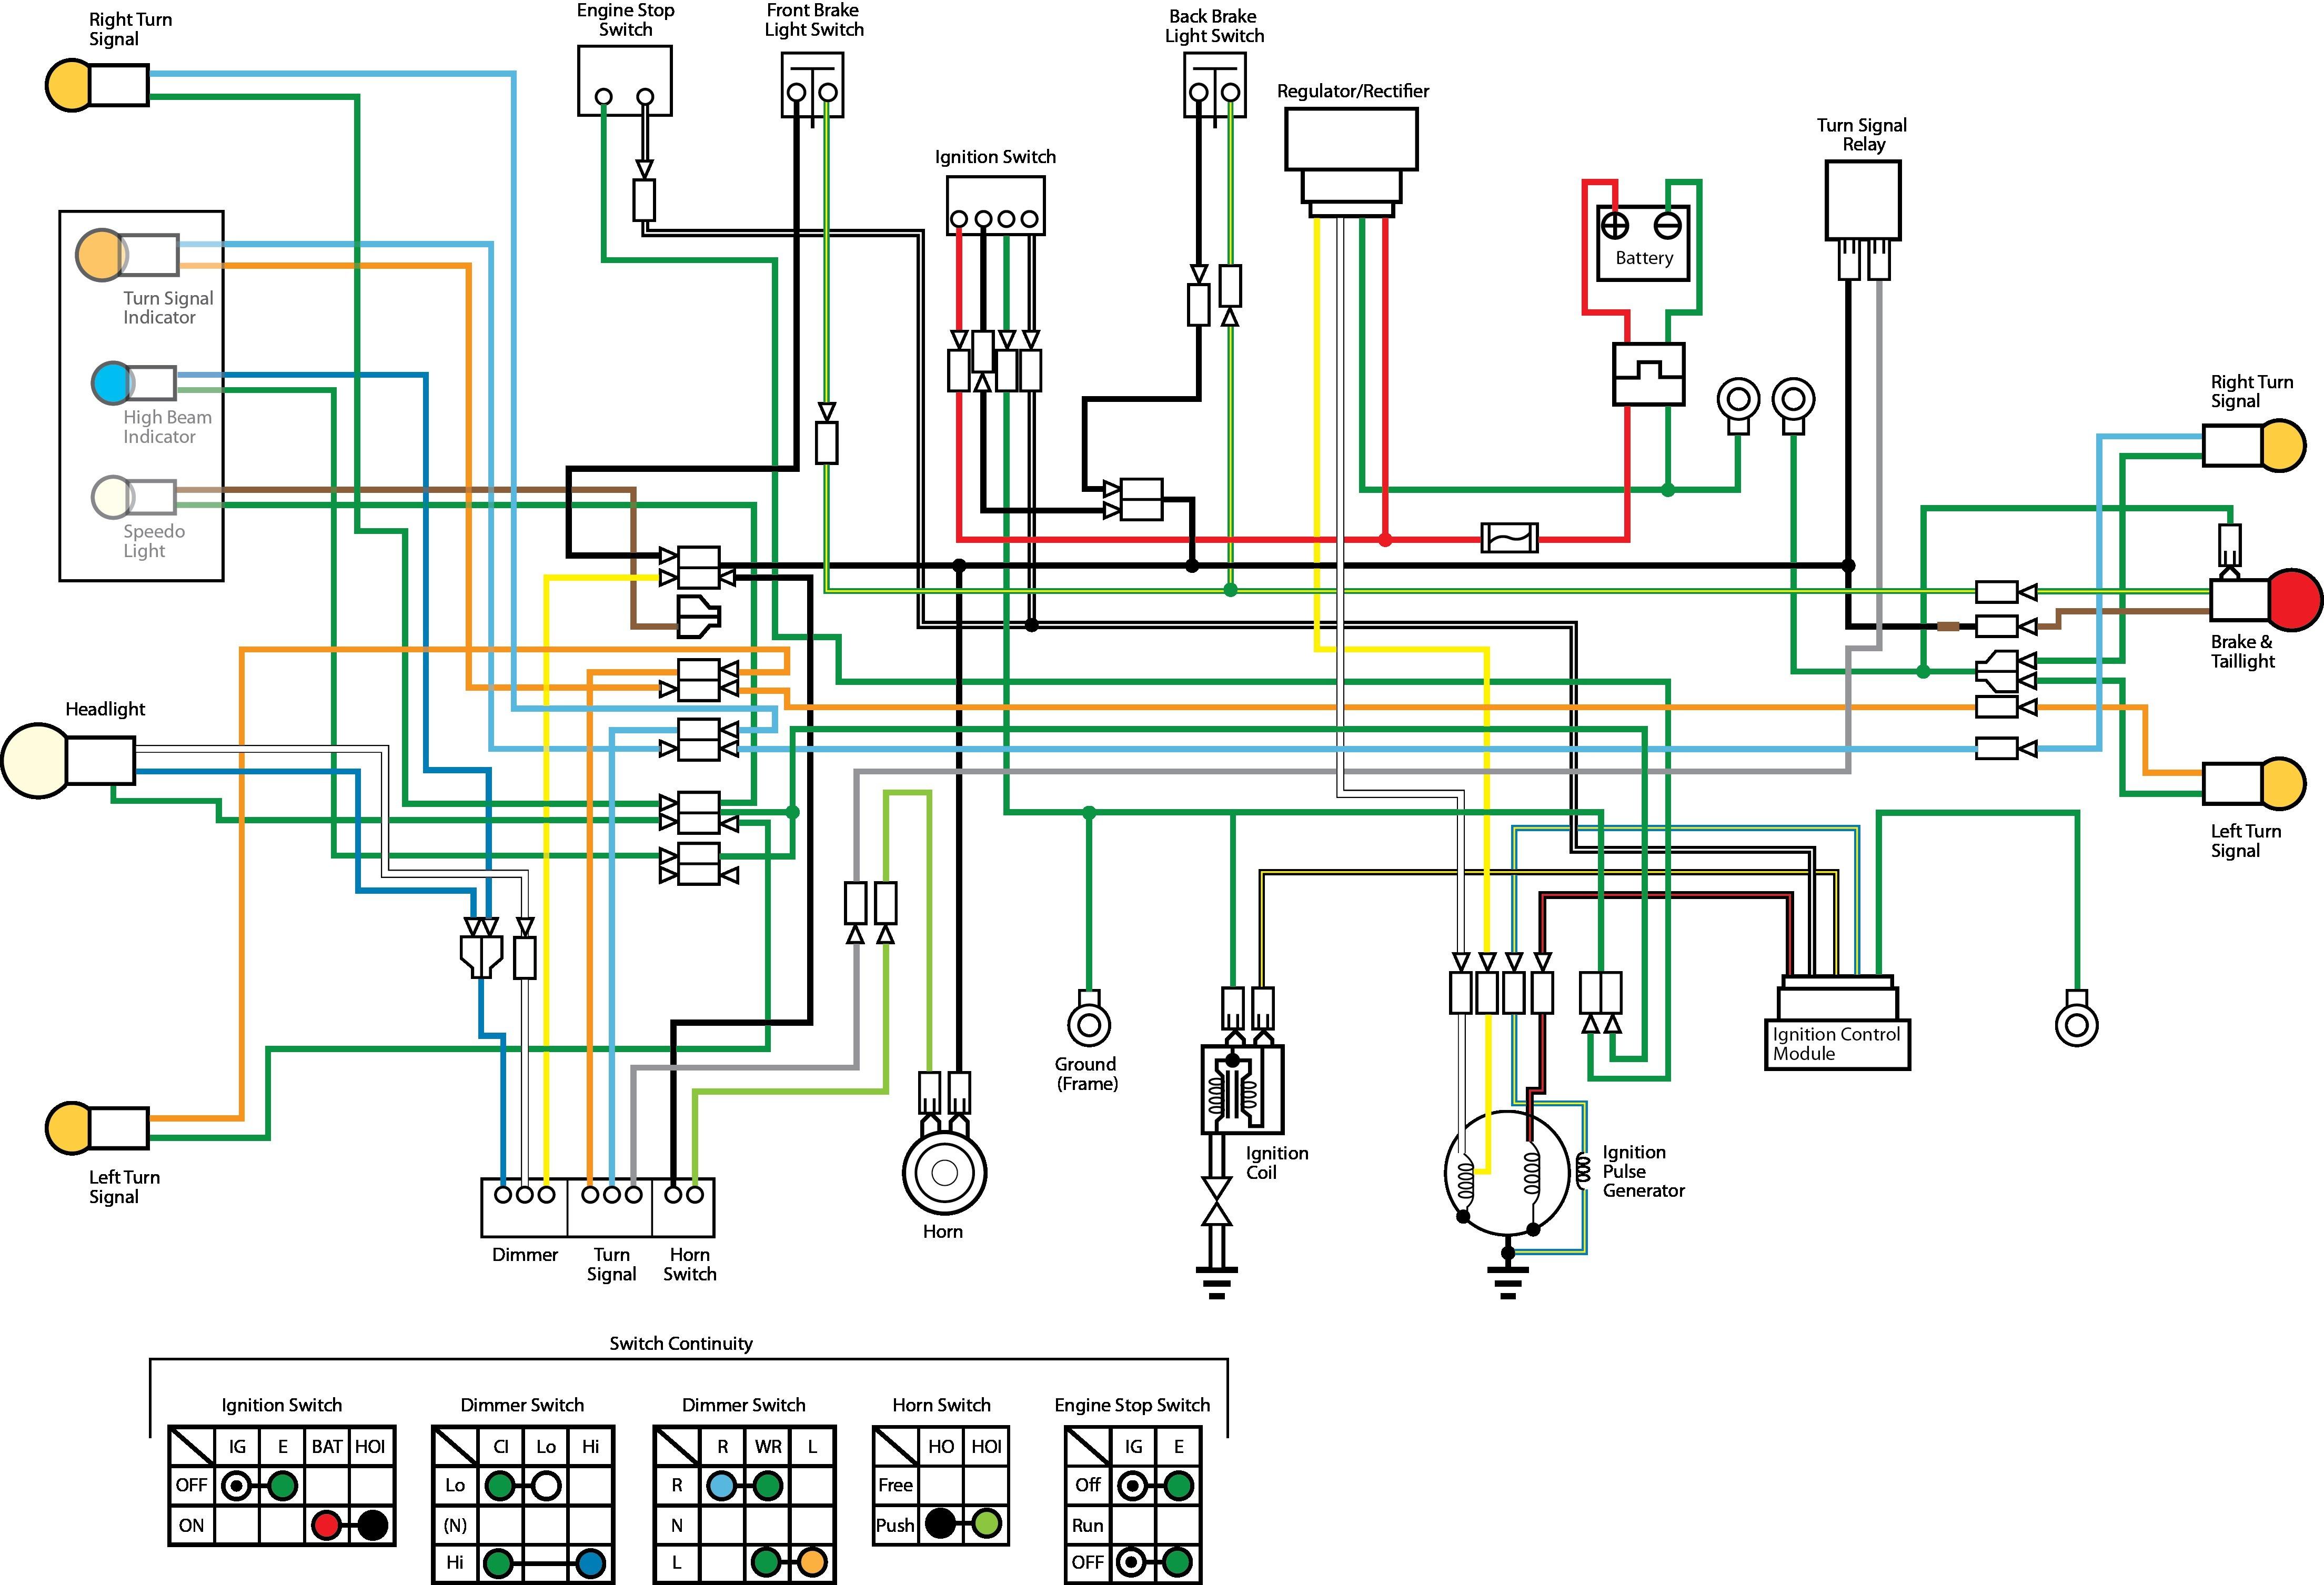 Honda Motorcycle Diagram Inspirational Electrical Wiring Diagram Diagram Of Honda Motorcycle Diagram